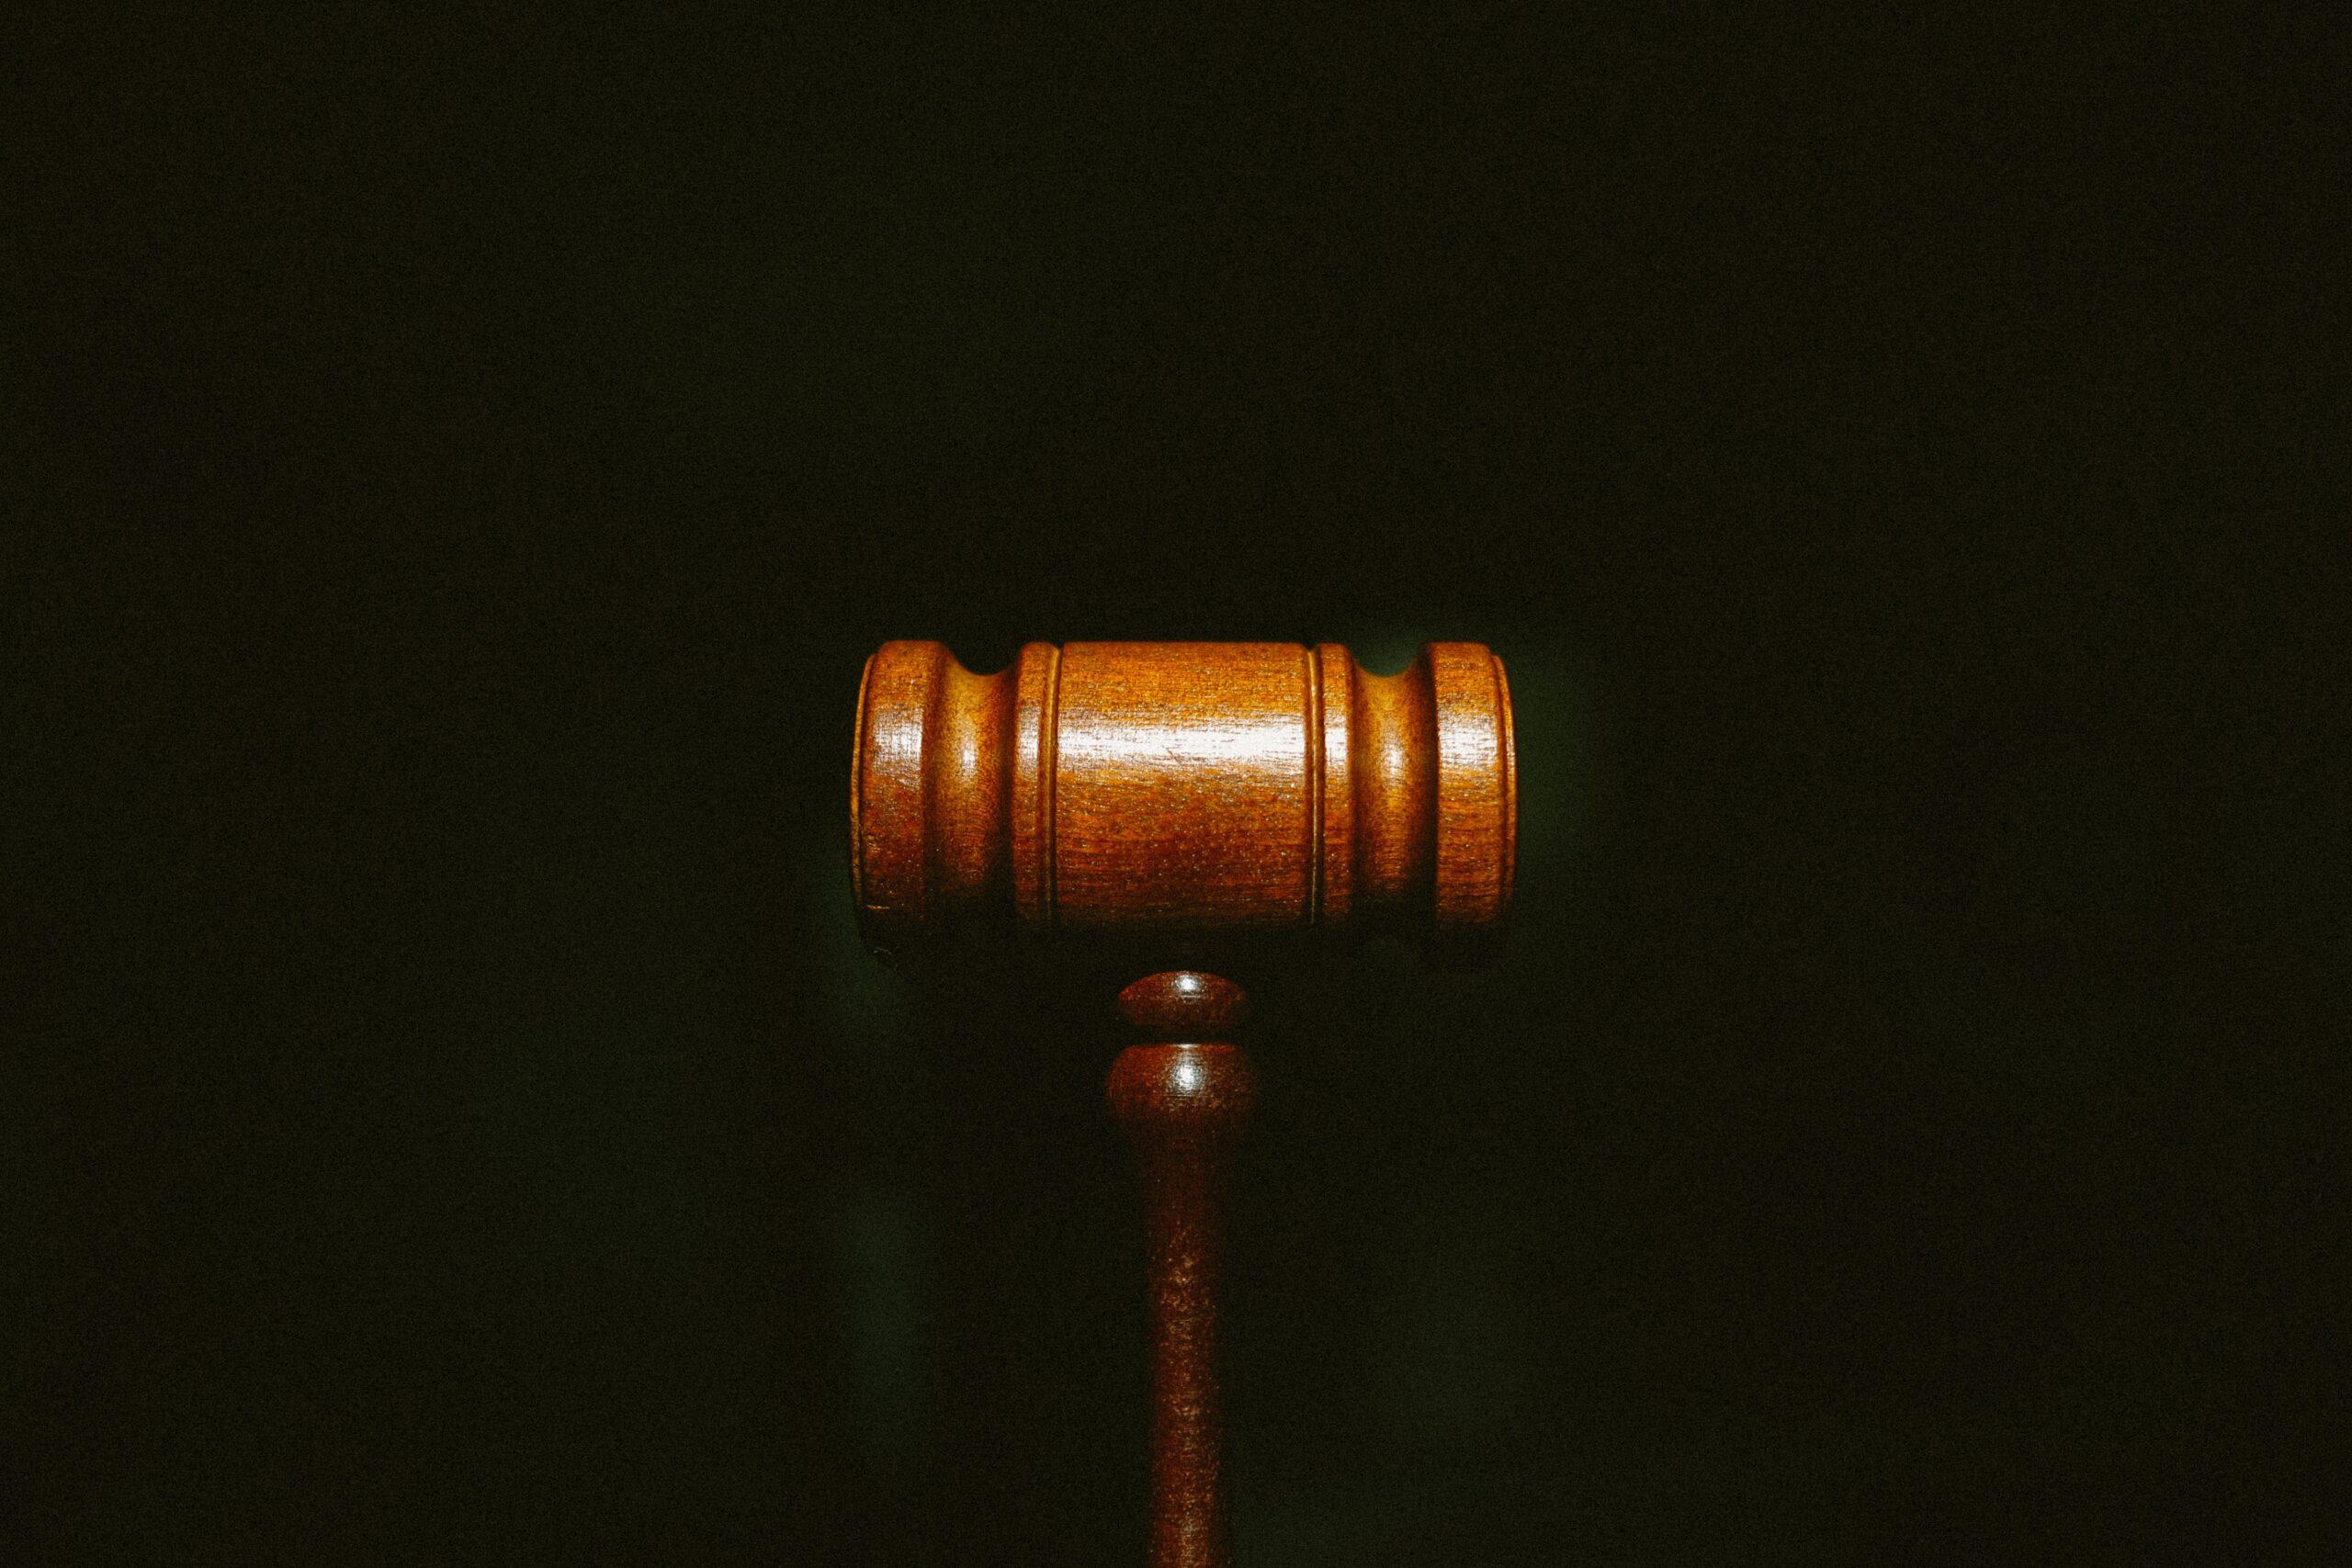 tingey injury law firm nSpj Z12lX0 unsplash 1 scaled - Do You Need a Family Law Professional?